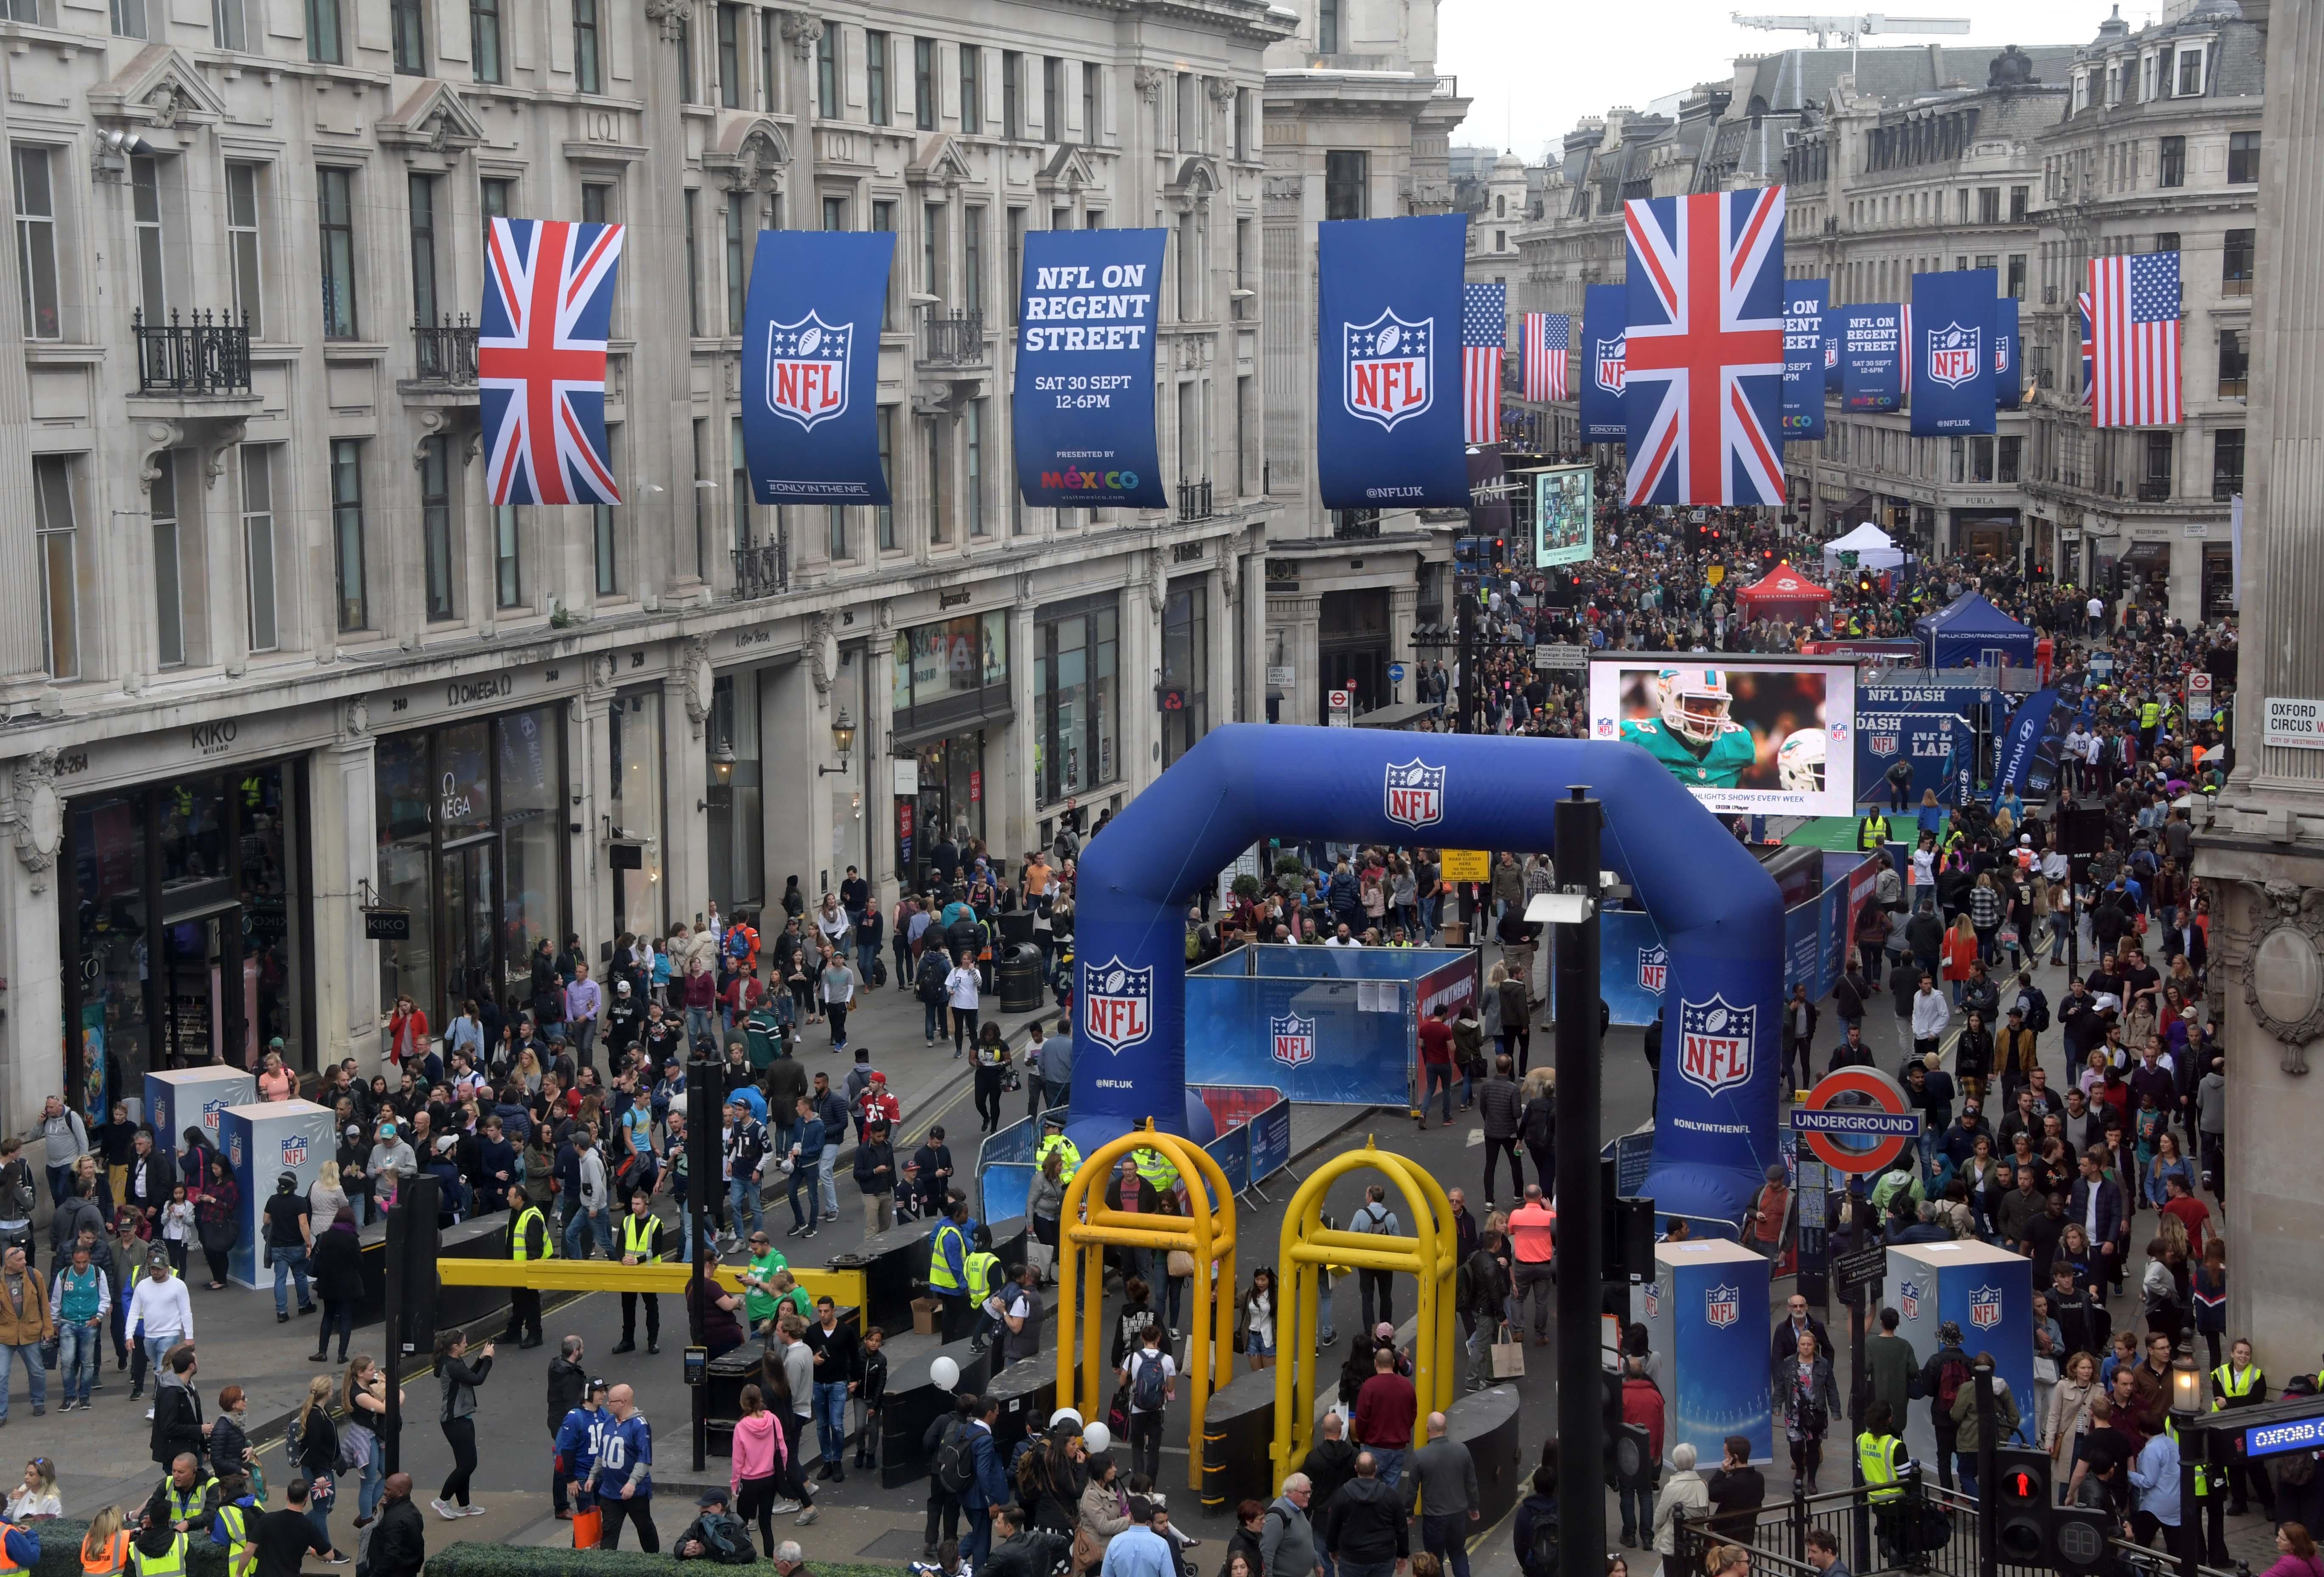 NFL: International Series-NFL on Regent Street